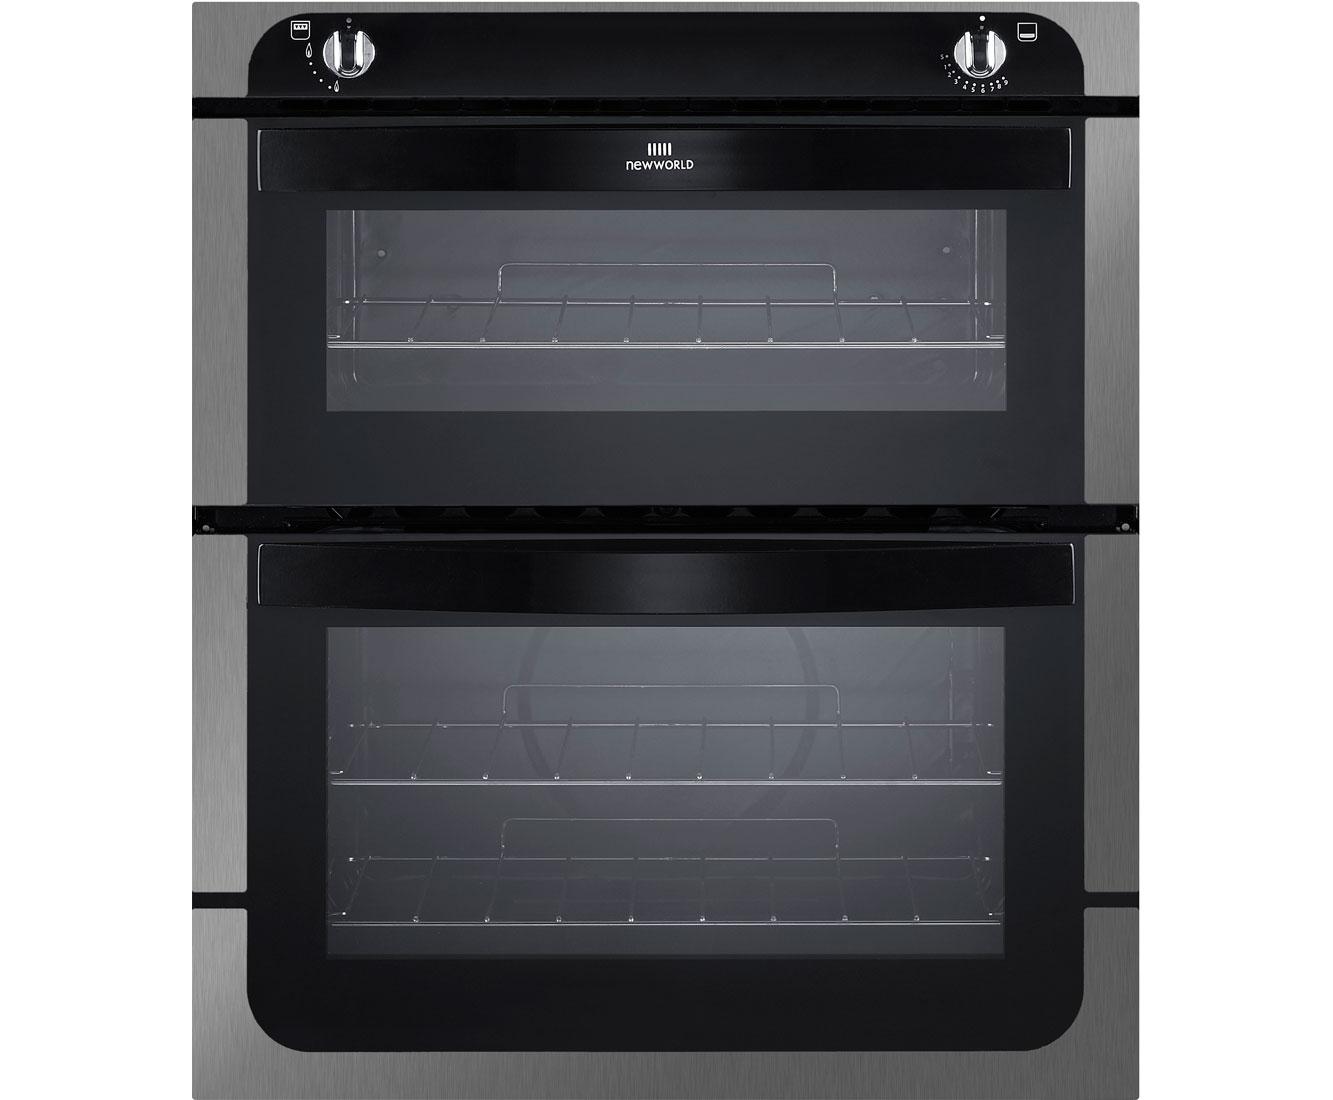 New World Kitchen Appliances Boots Kitchen Appliances Washing Machines Fridges More